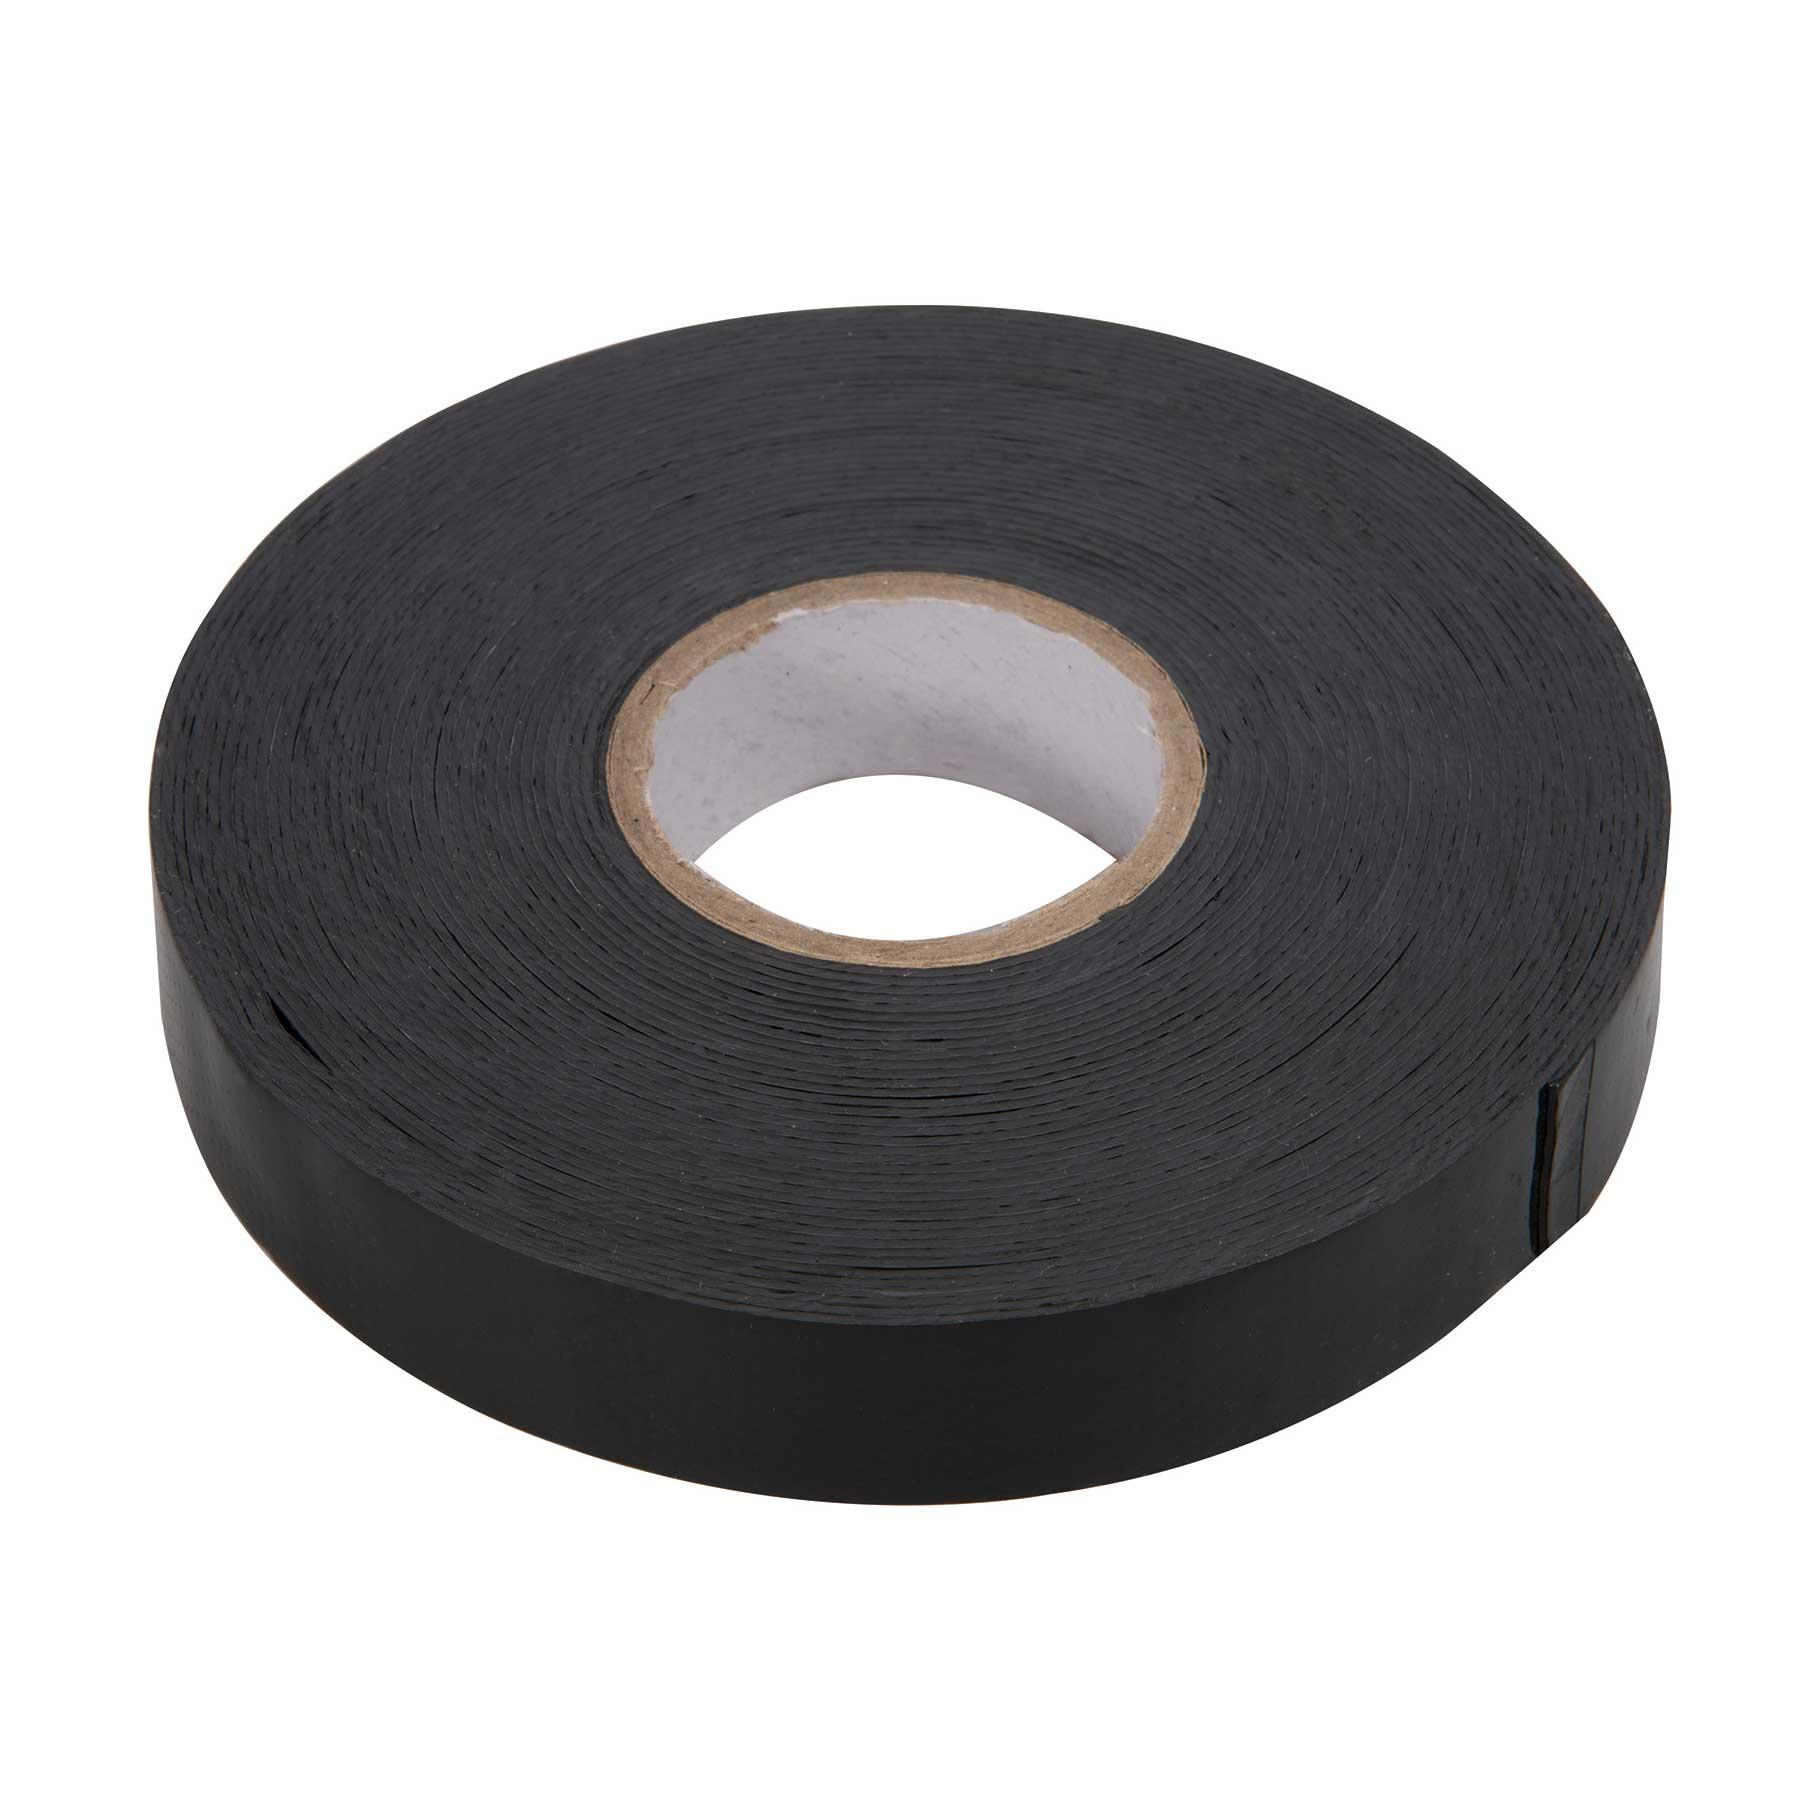 self amalgamating tape repair rubber waterproof sealing. Black Bedroom Furniture Sets. Home Design Ideas